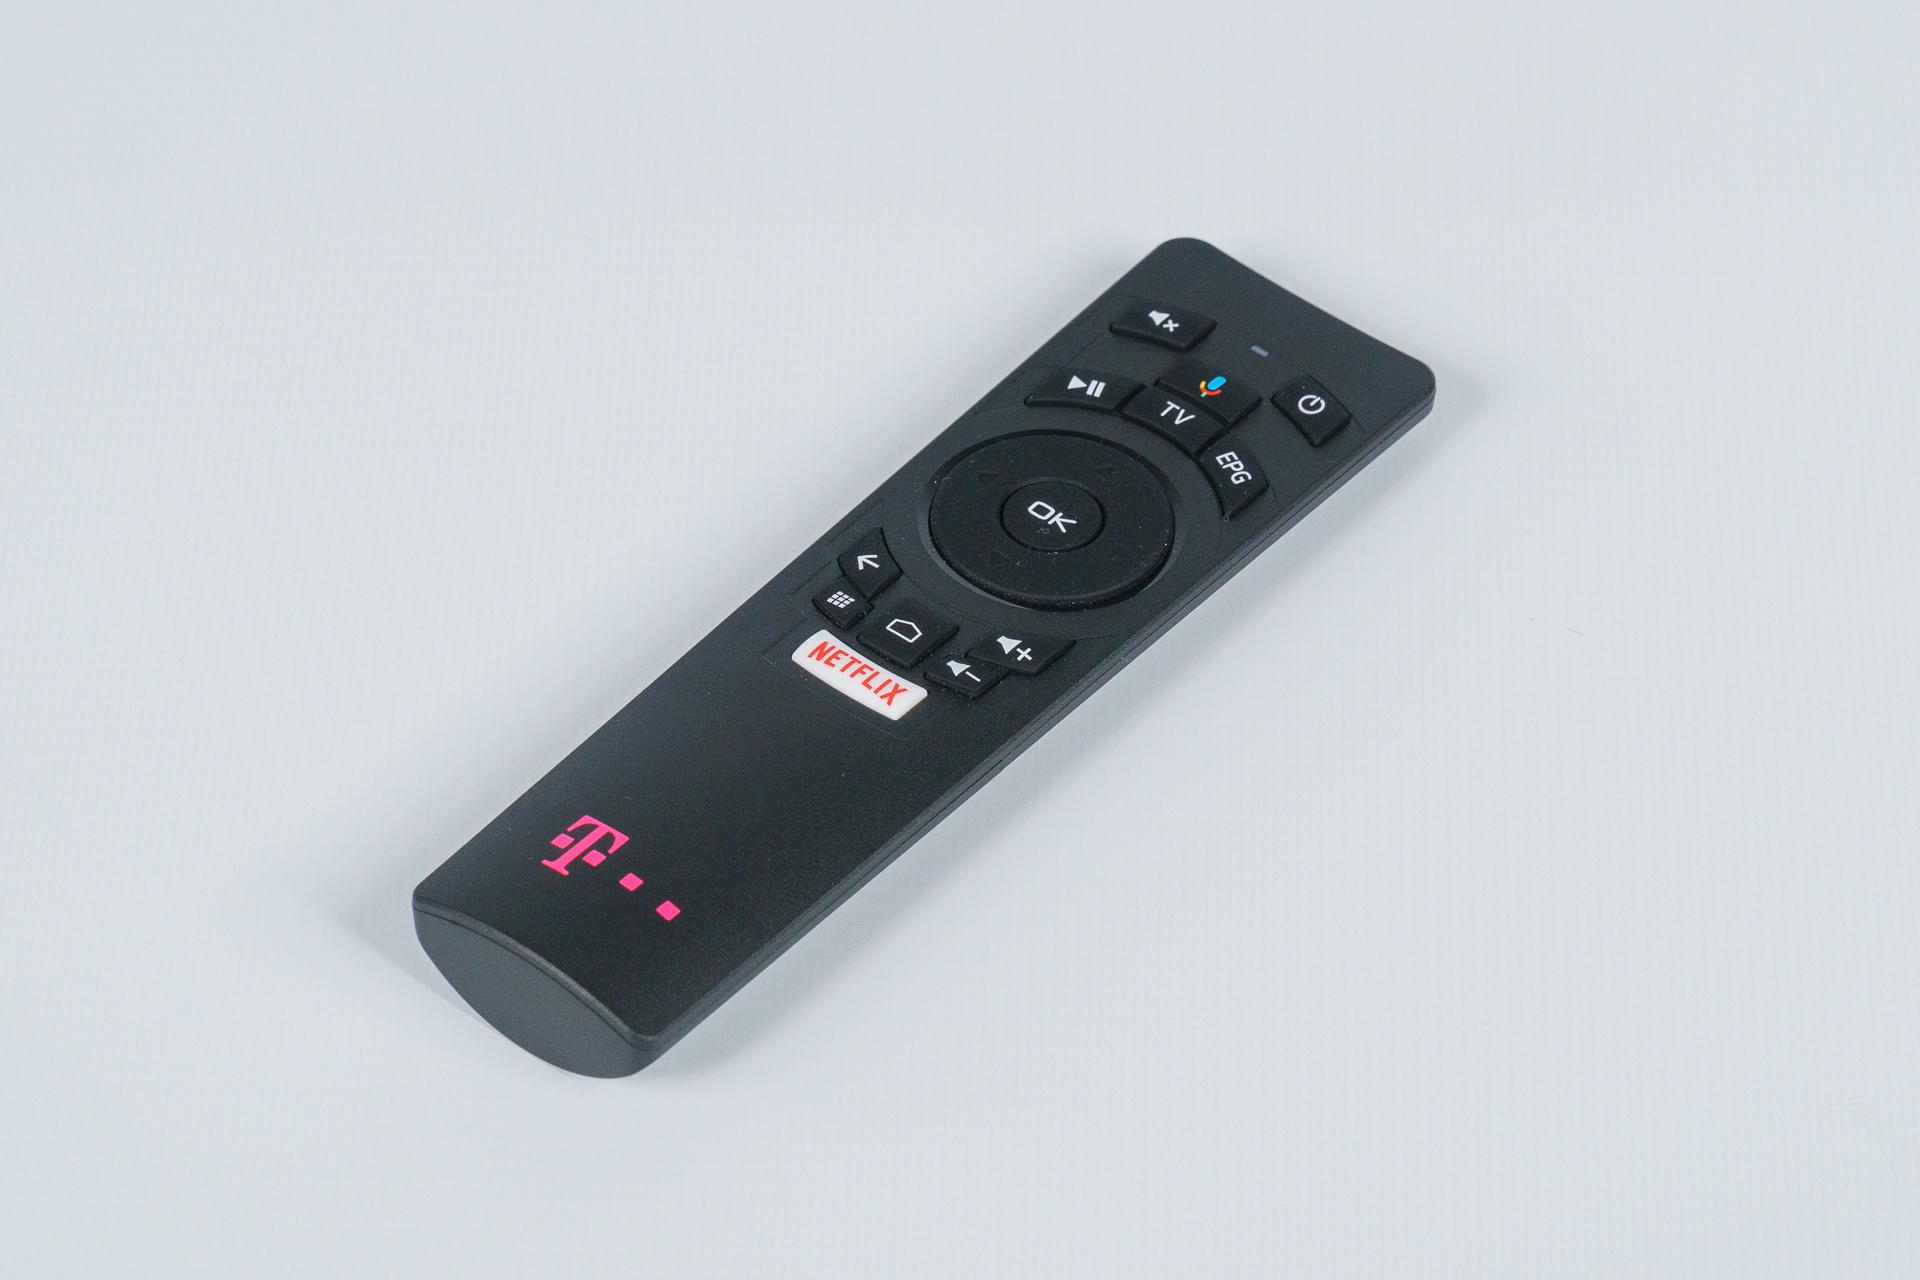 Dekoder T-Mobile Magenta - podano Netflixa, mój panie